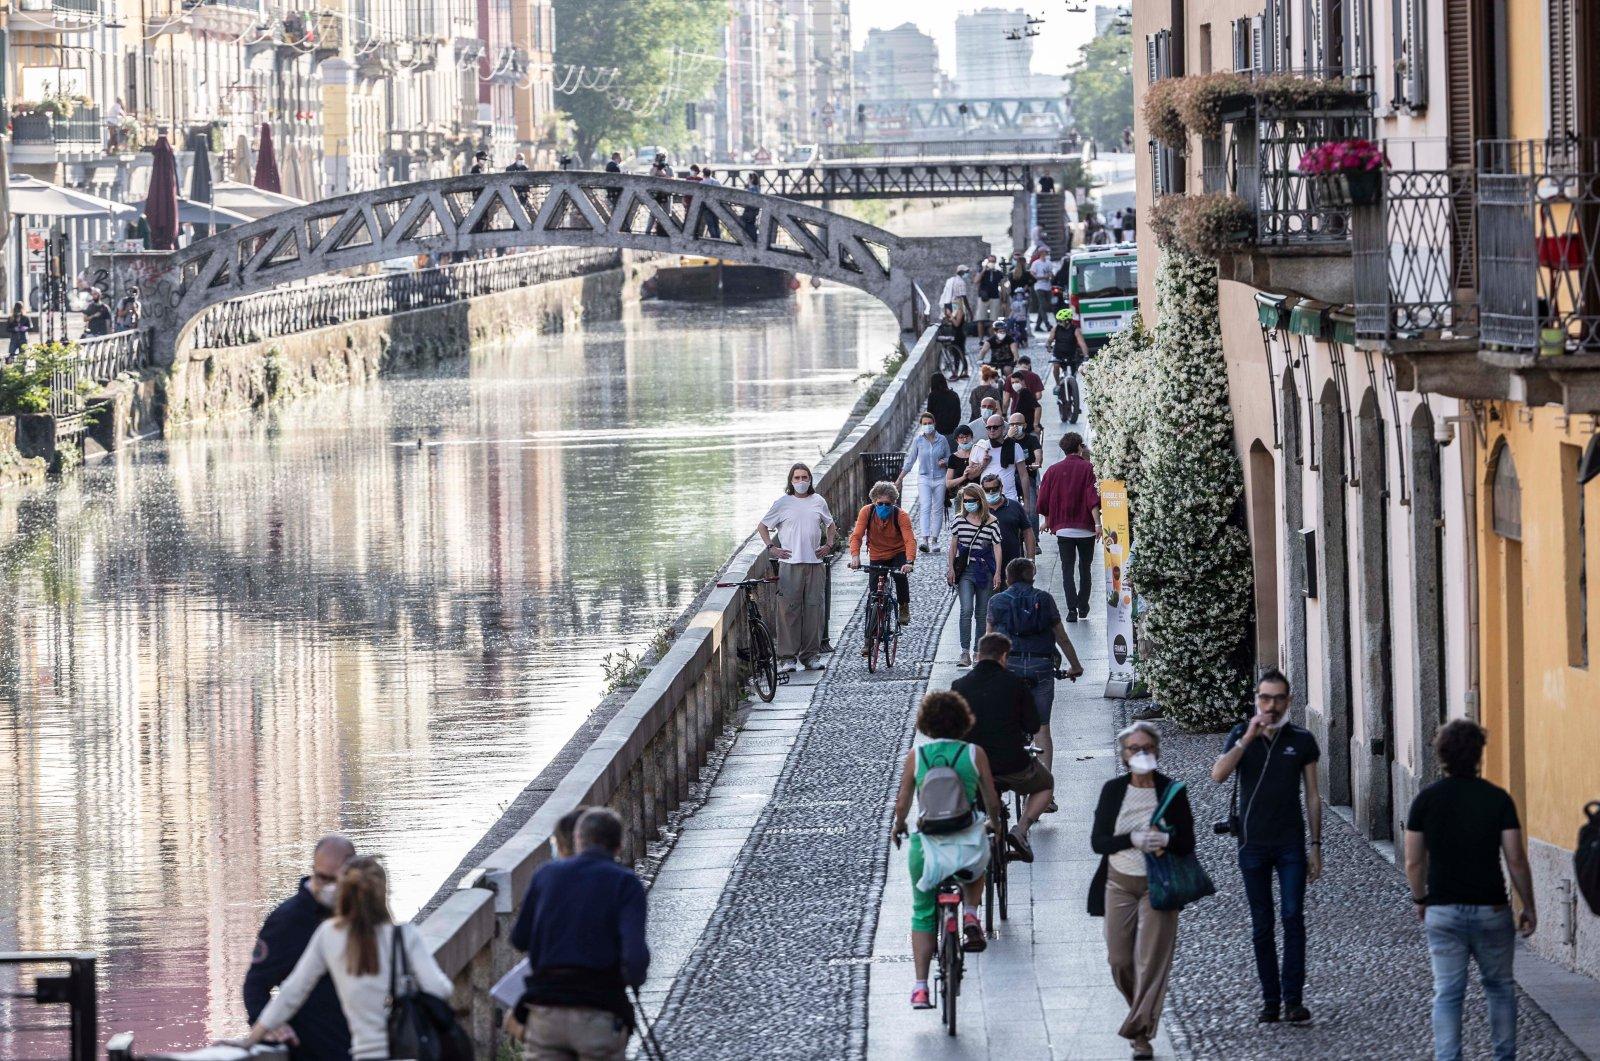 People walk along the popular Navigli area during the coronavirus outbreak, Milan, Italy, May 8, 2020. (AP Photo)